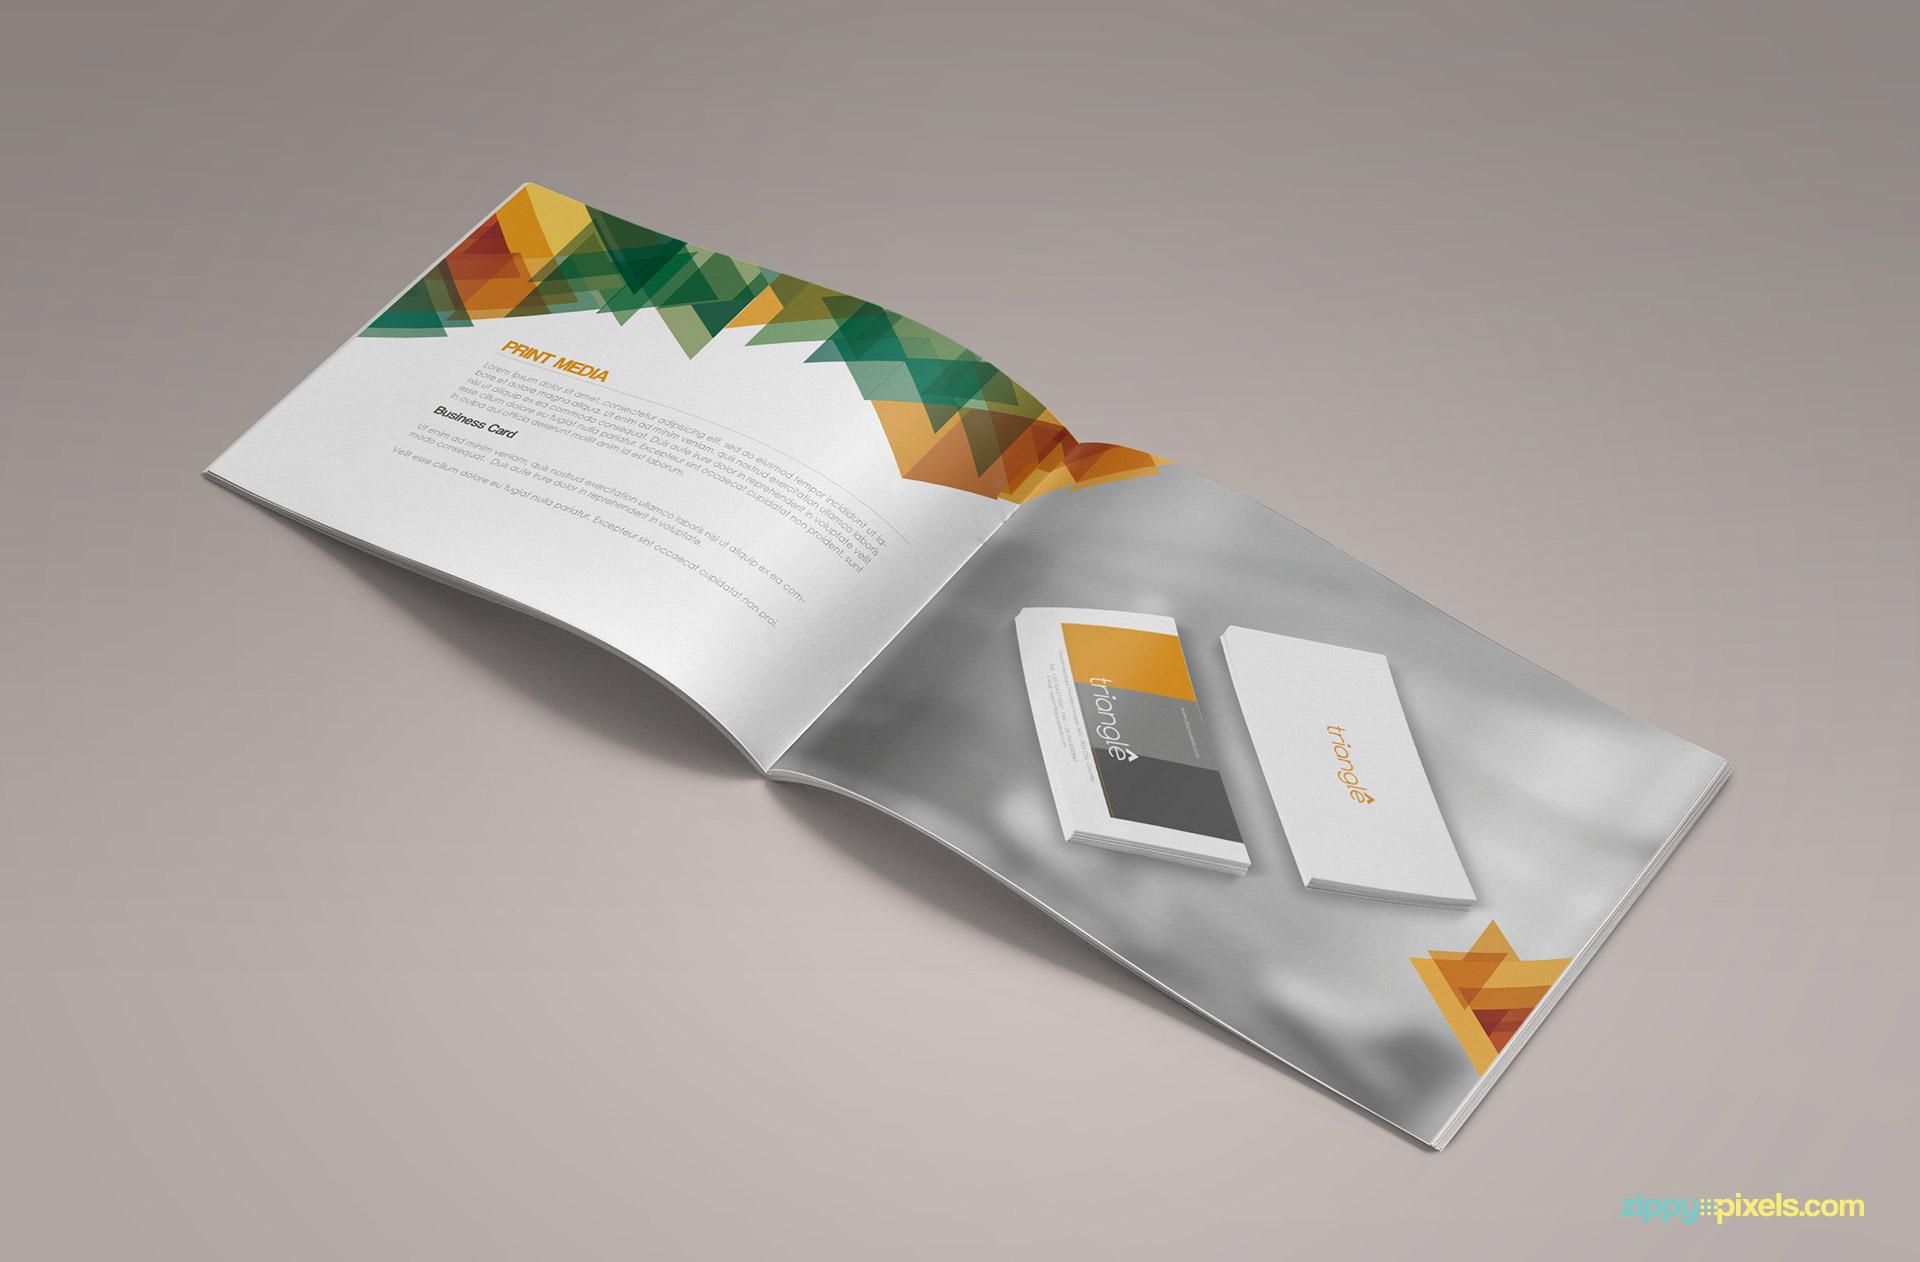 11-brand-book-9-print-media